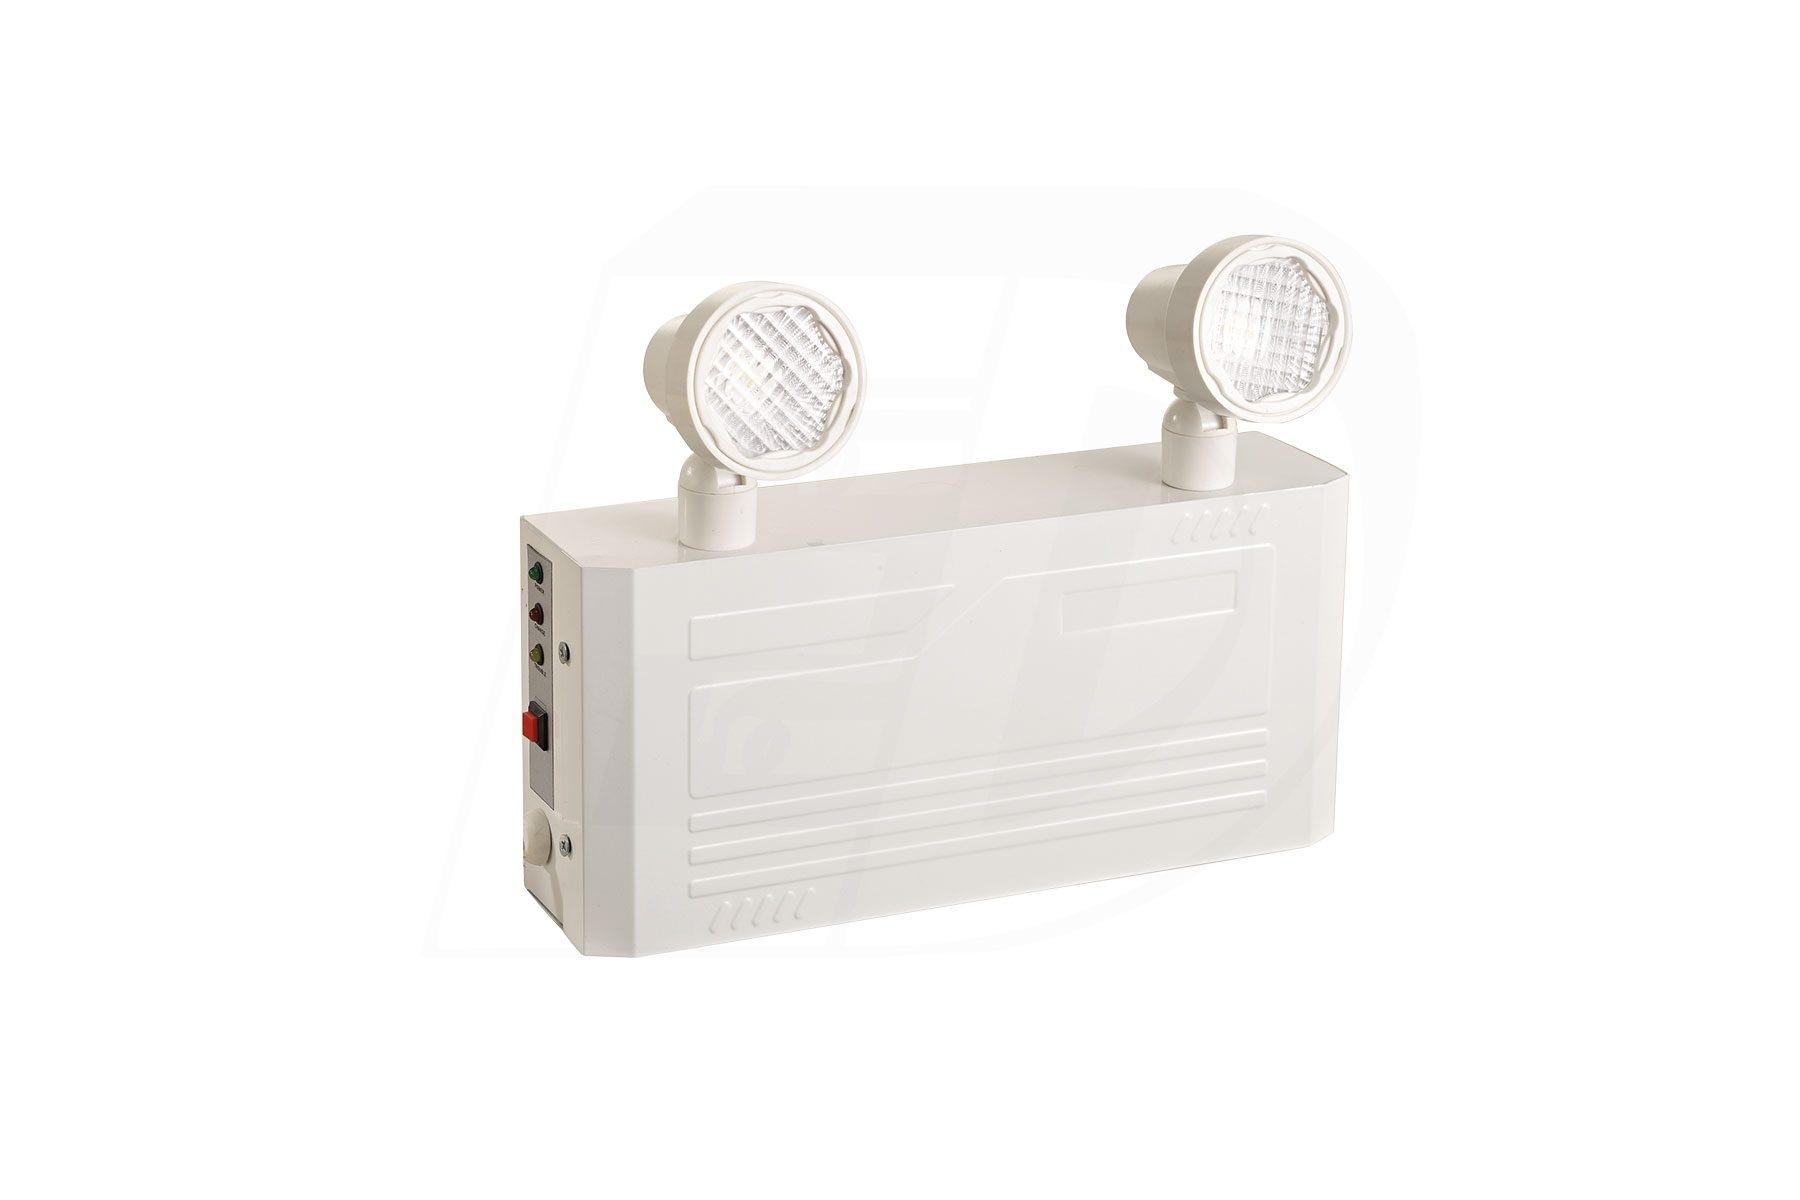 ER300D-WHM-A13-BB-4RC - LED EMERGENCY LIGHT BATTERY UNIT